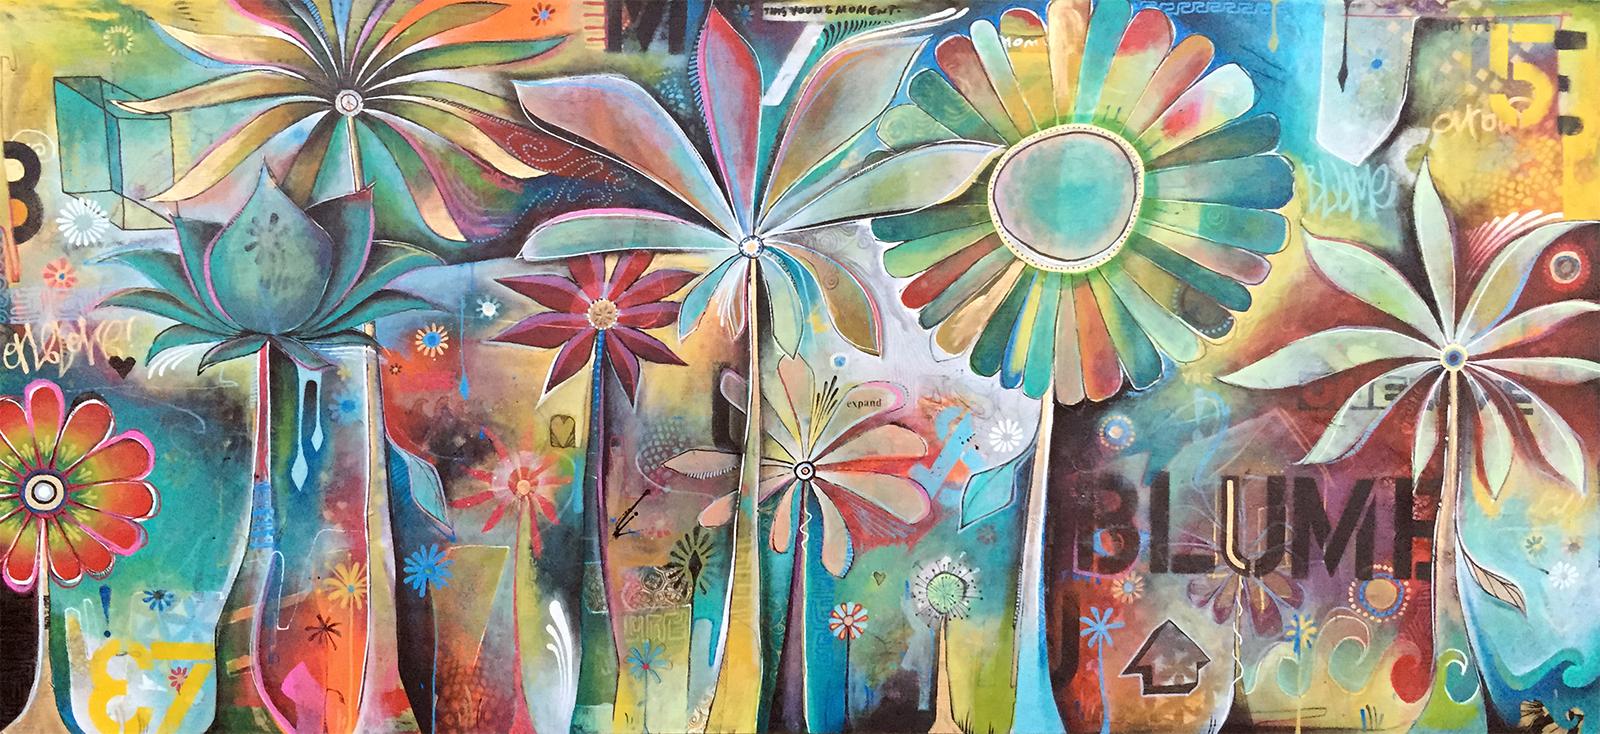 'Blume' Mixed media on wood. 20h x 48w. 2015